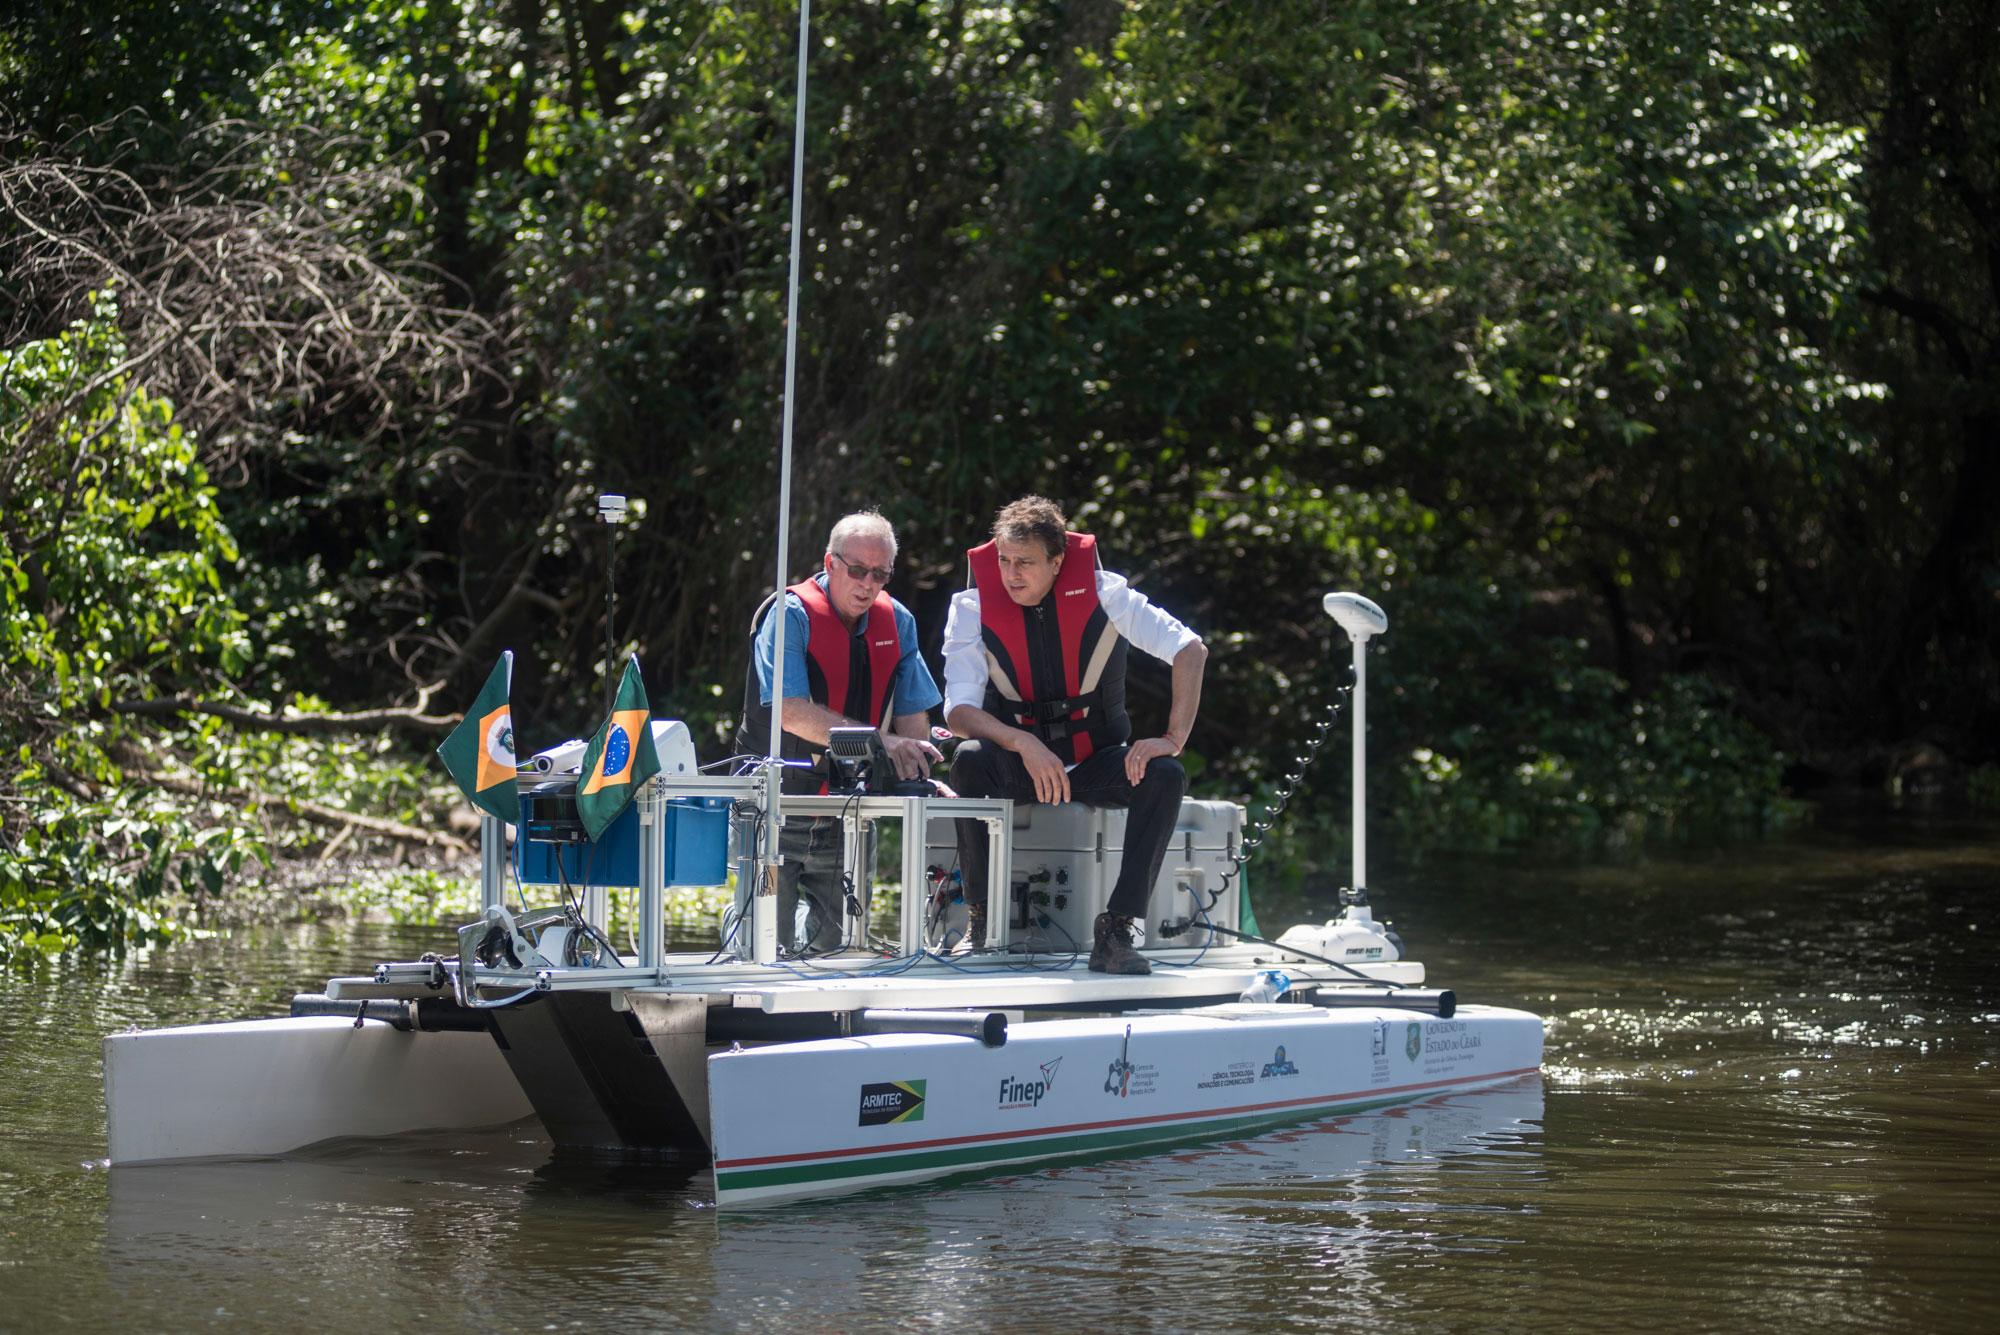 Barco robótico vai ajudar a monitorar o meio ambiente